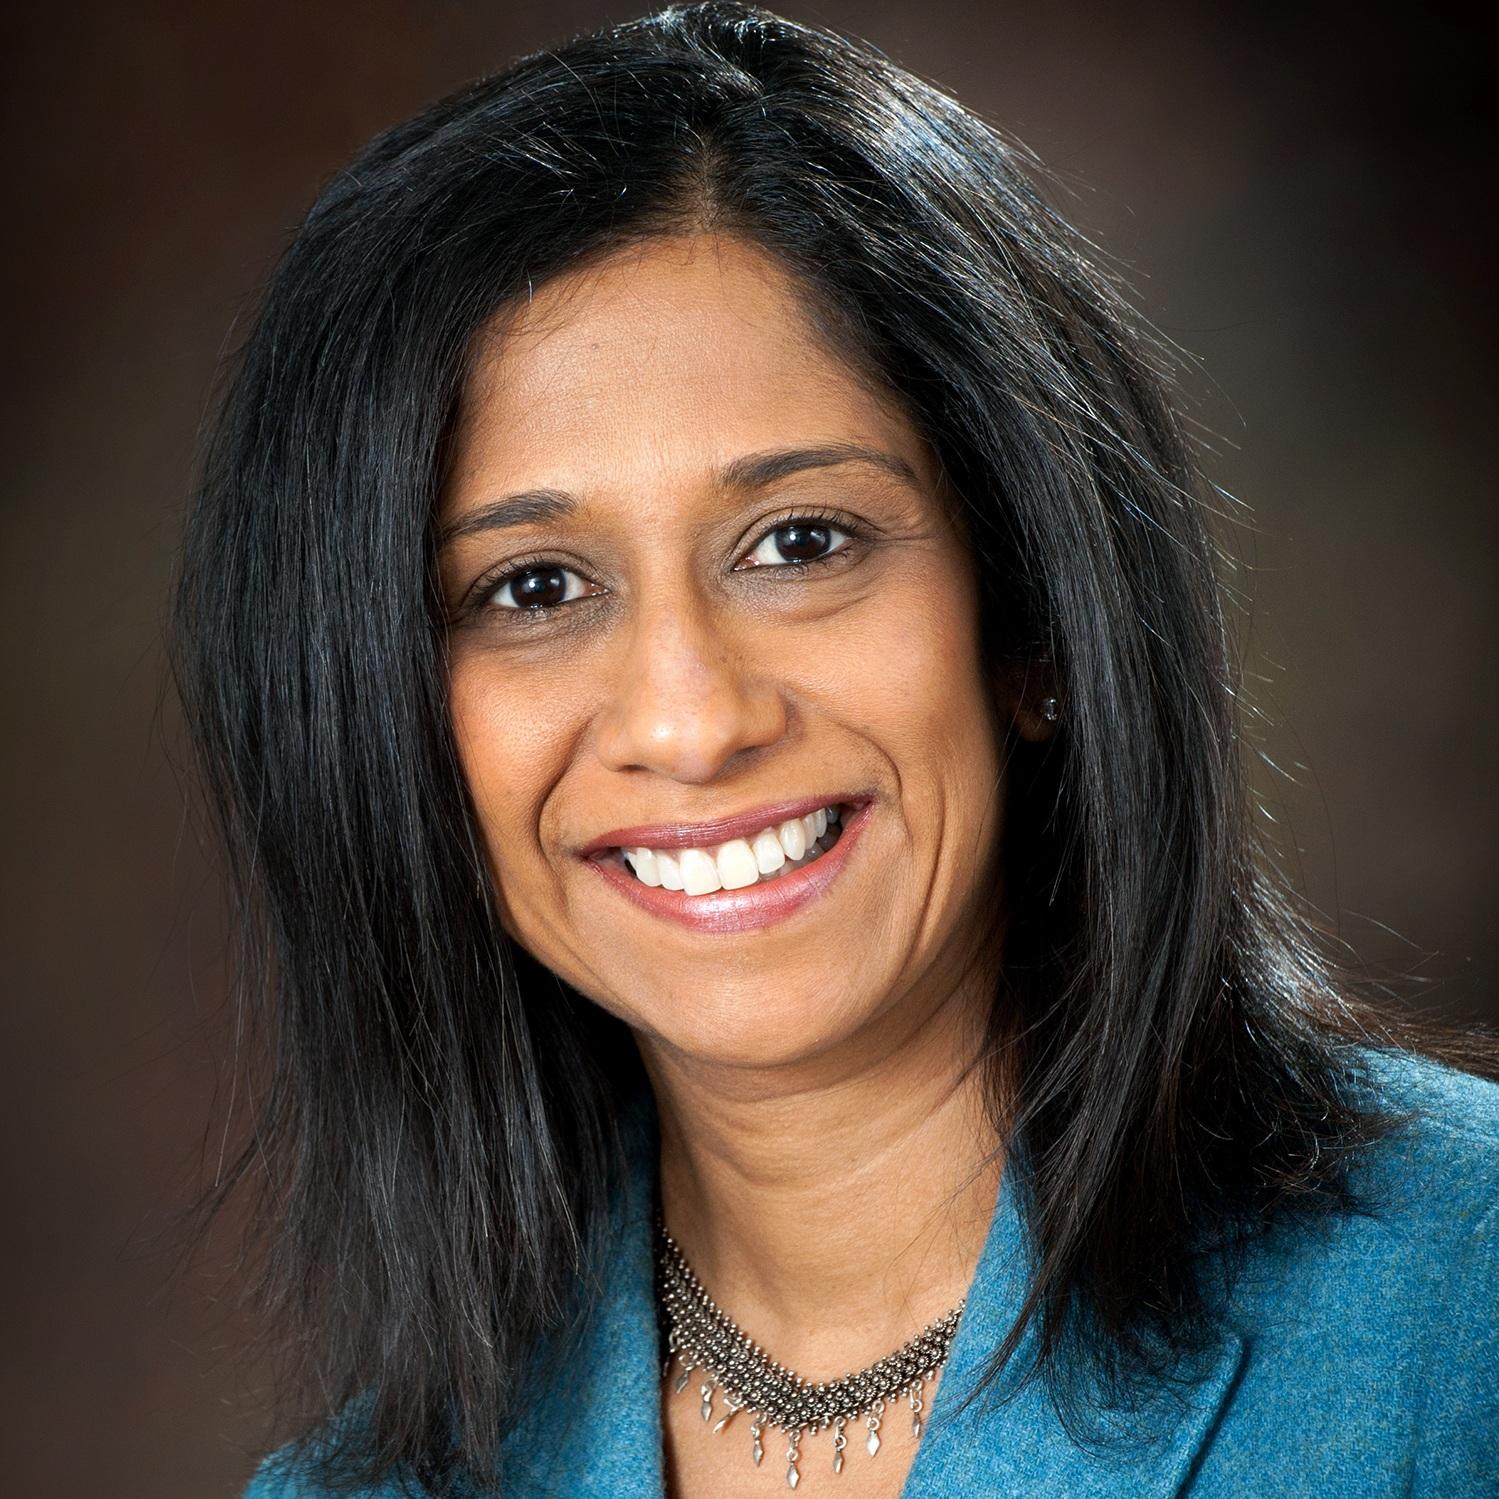 Jai Sweet, PhD - Senior Director, Student Development & Academic Services, Cornell University College of Veterinary Medicine